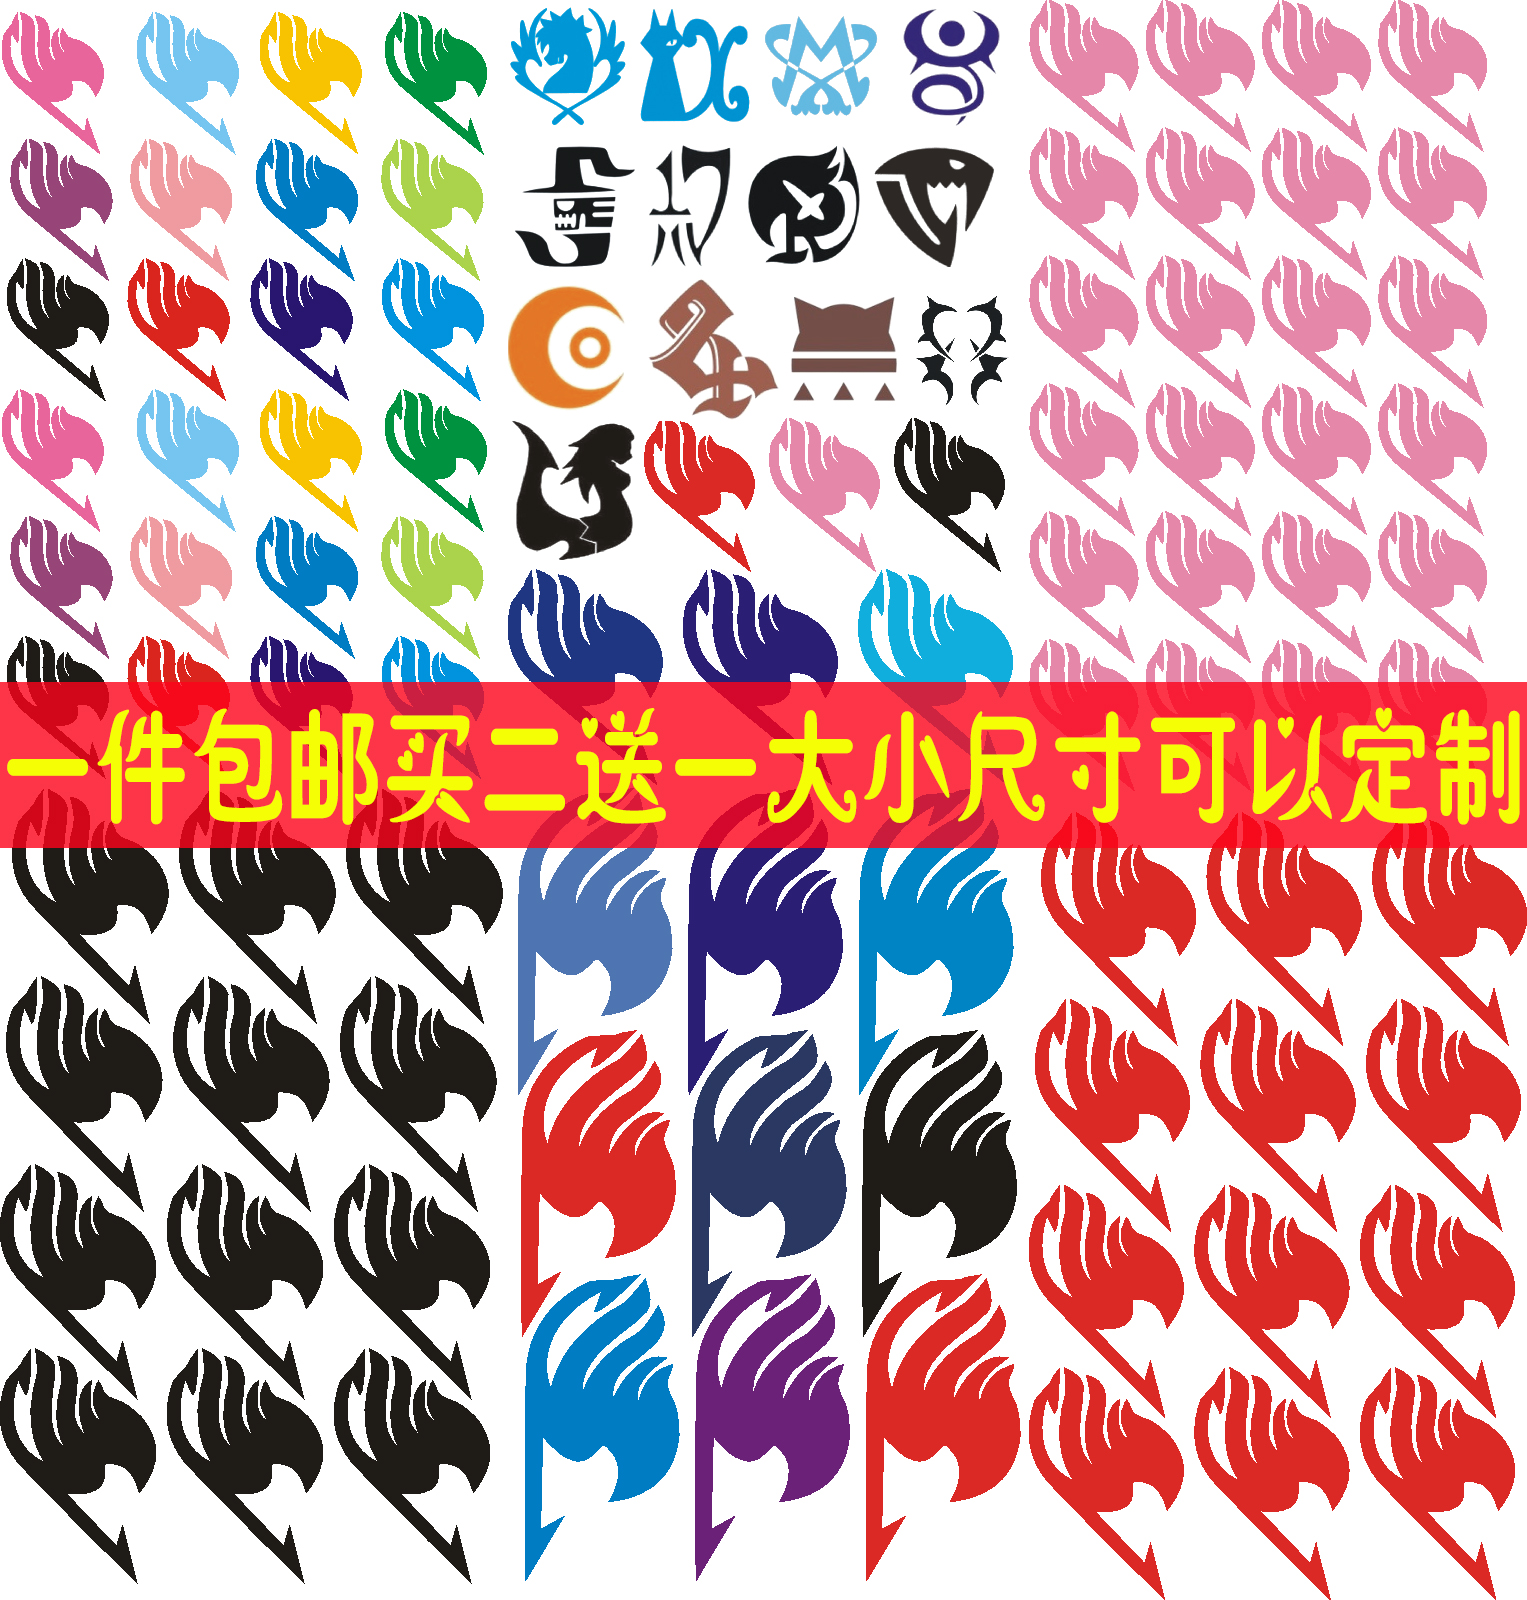 340e6e1a2 Anime Fairy Tail Naz Lucy Elisha demon Tail guild logo COS tattoo stickers